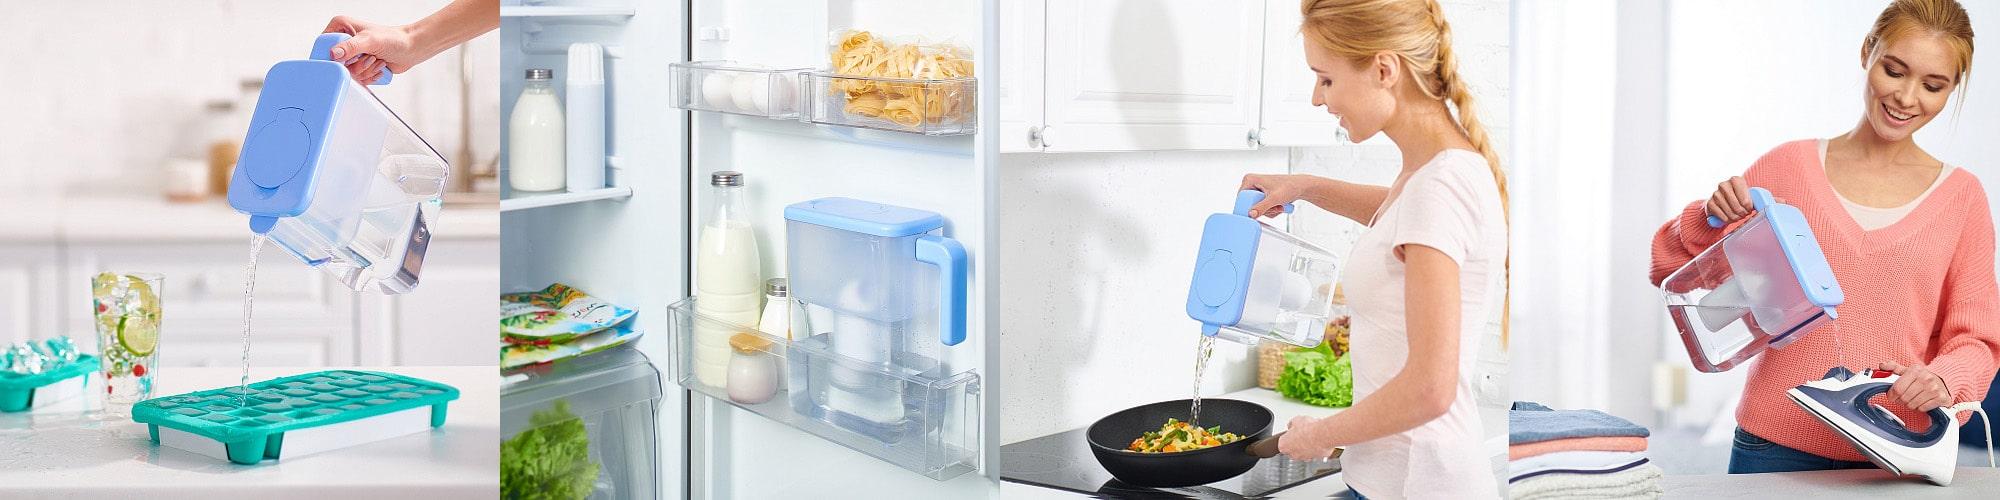 ecosoft dewberry filter jug uses